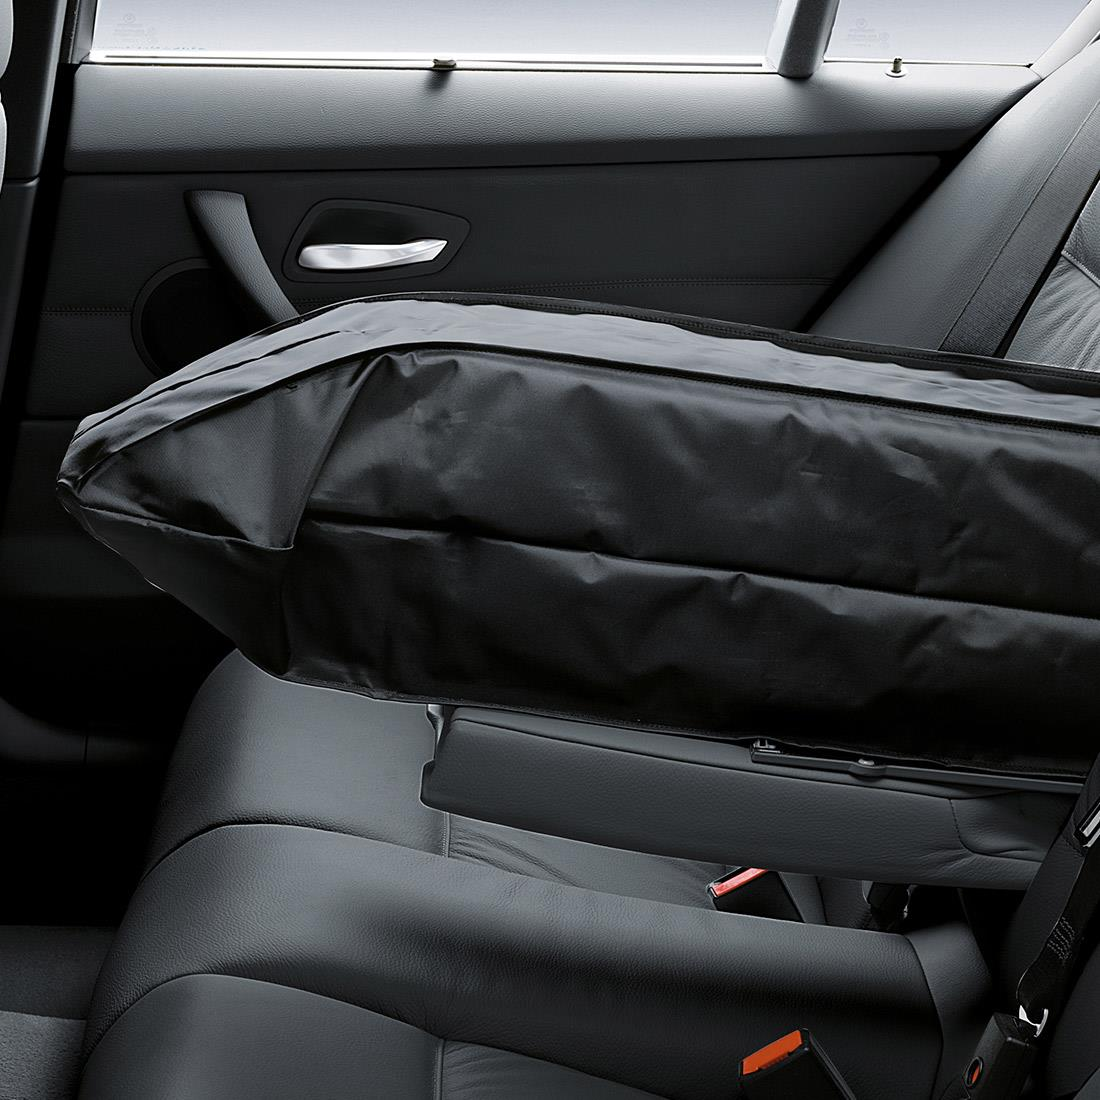 BMW Ski Bag